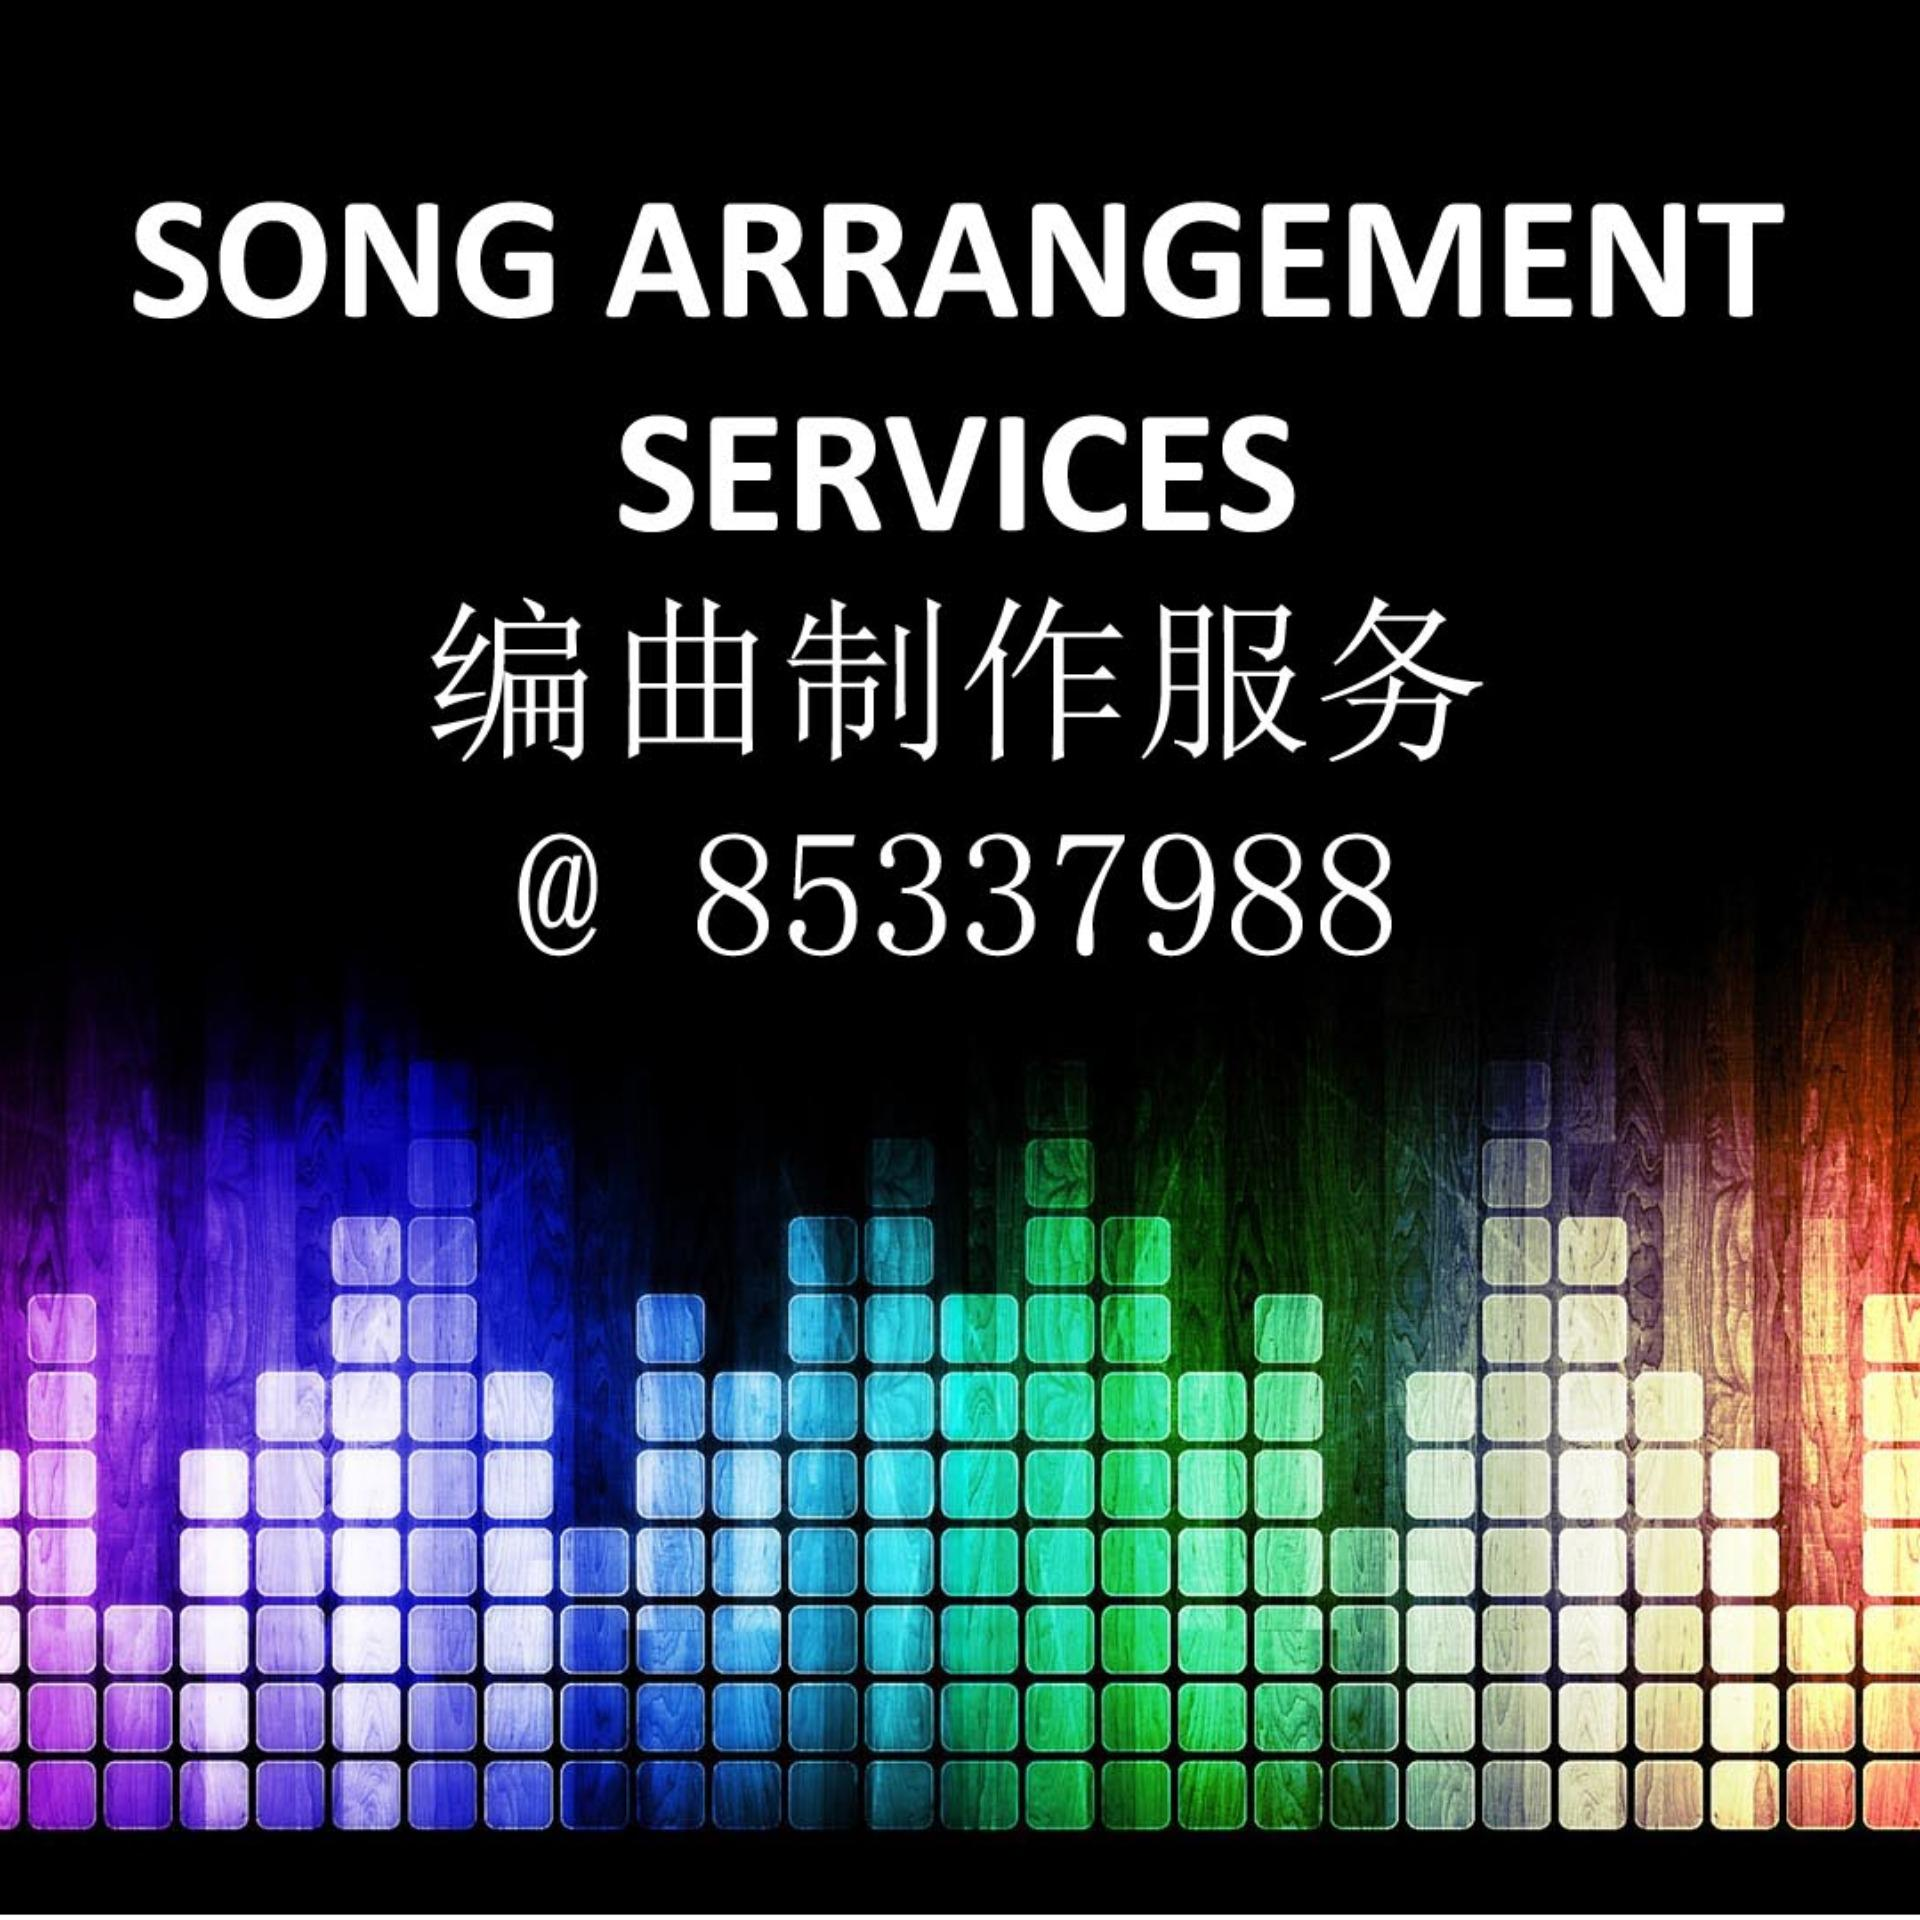 Music arrangement